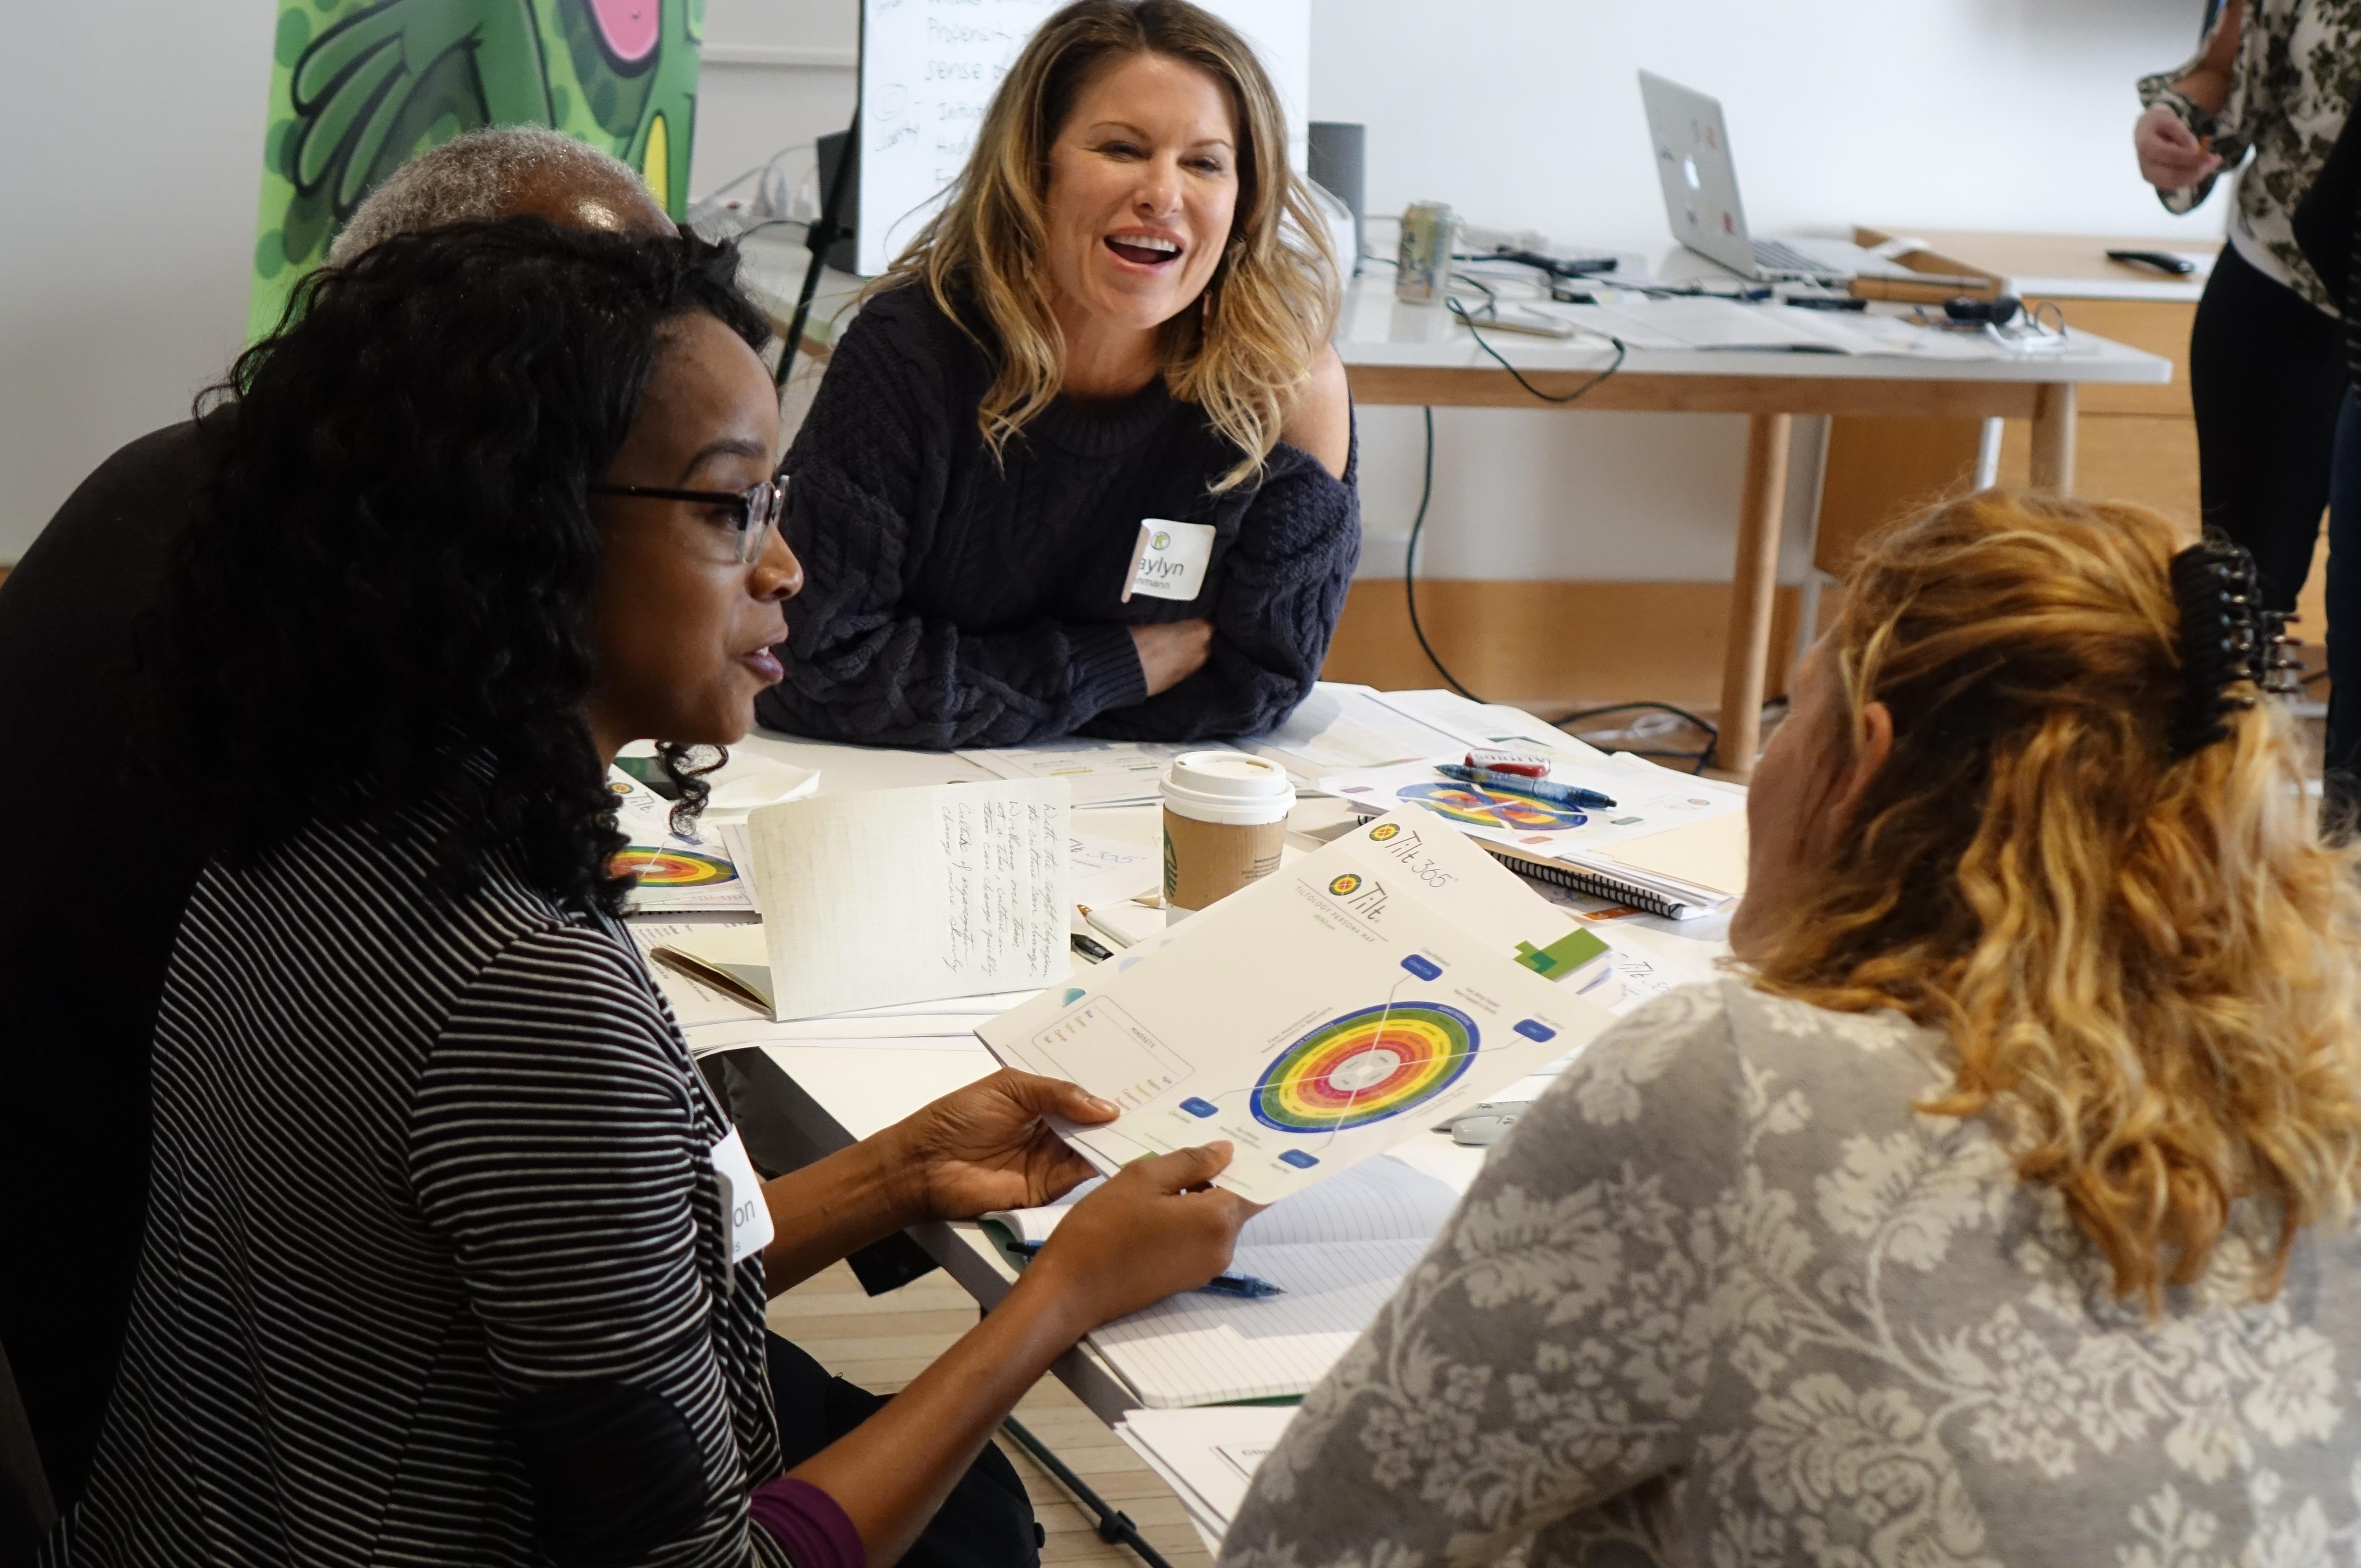 Participants enjoying a Tilt 365 Workshop